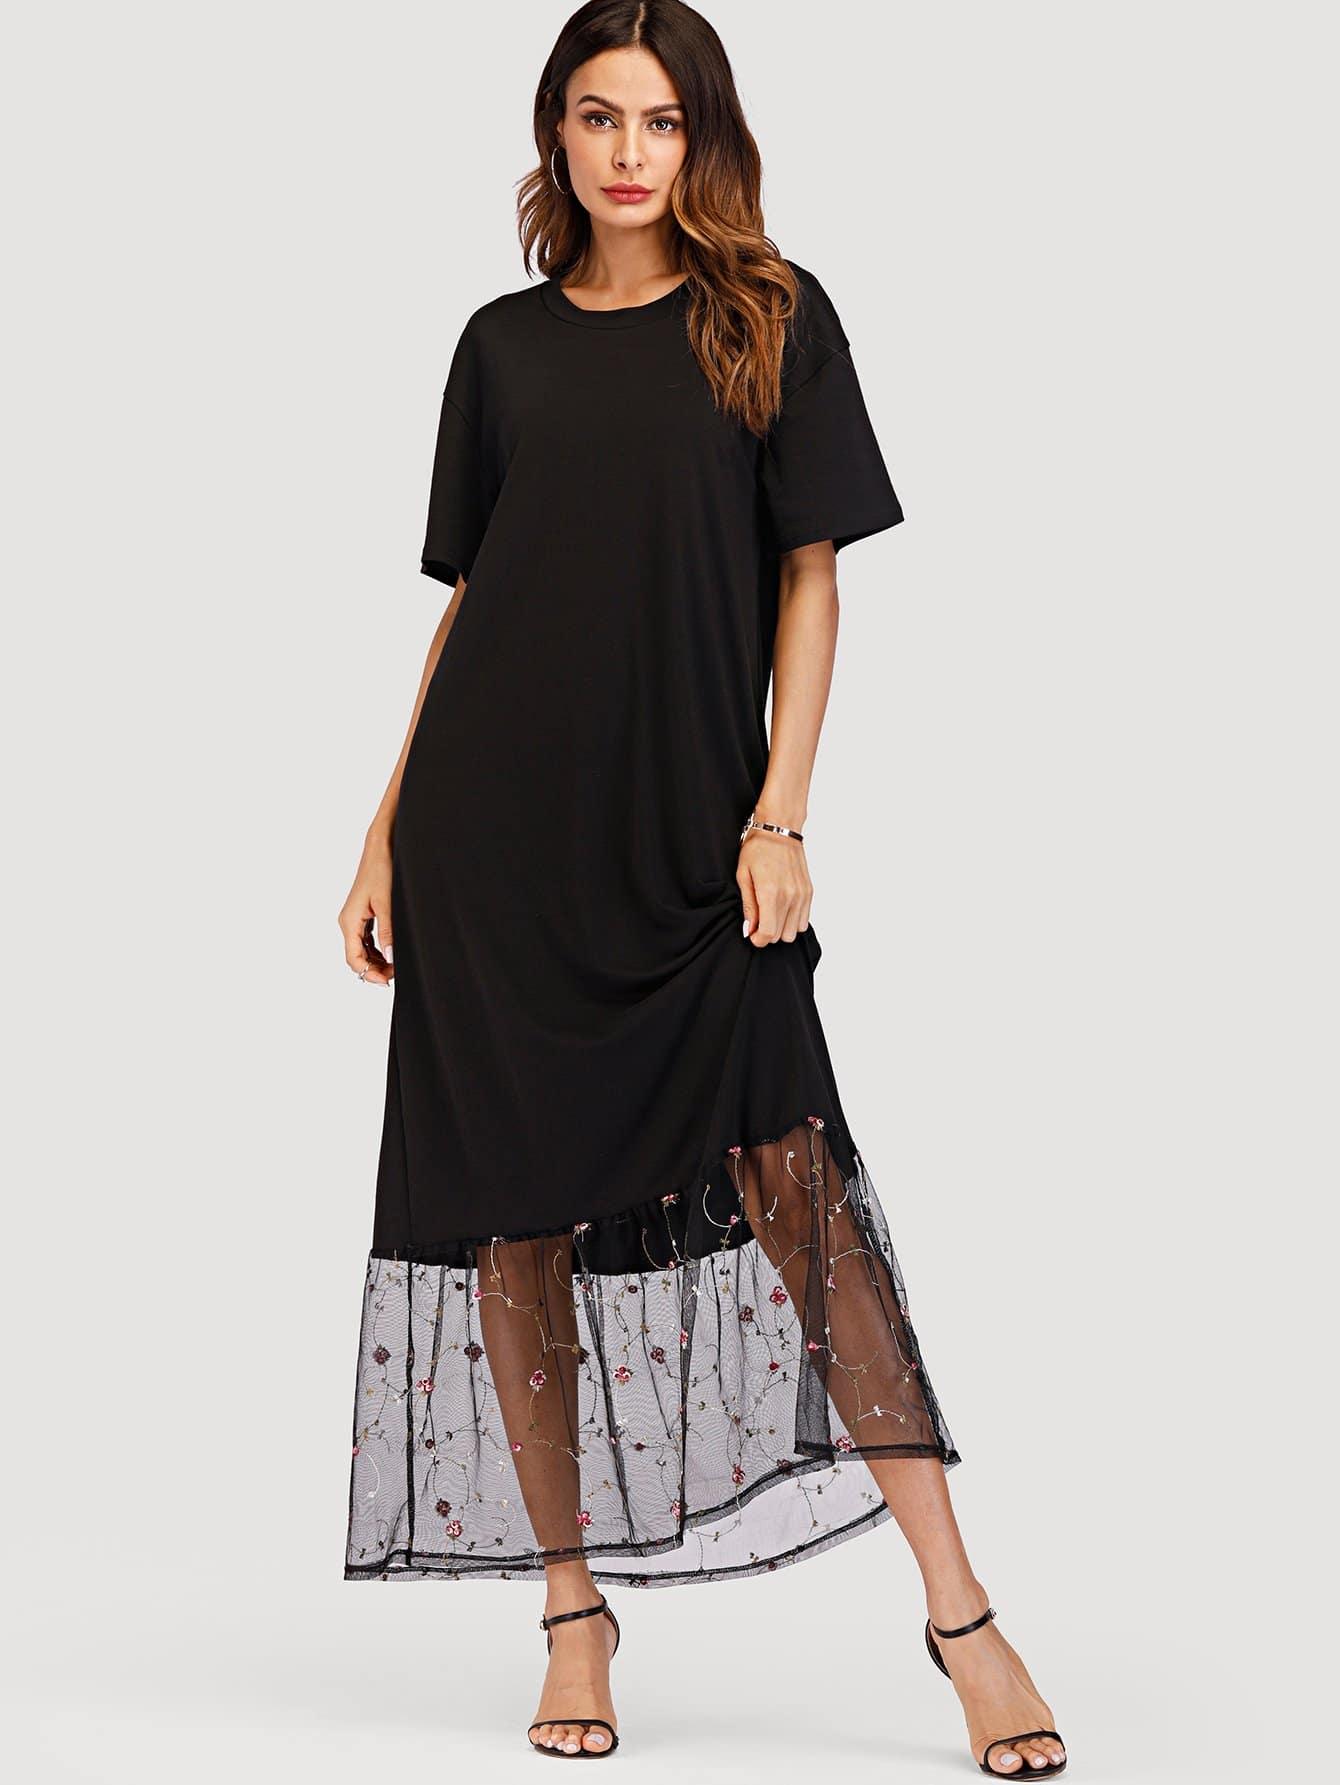 Embroidered Mesh Hem Panel Dress embroidered double layer asym hem sheath dress